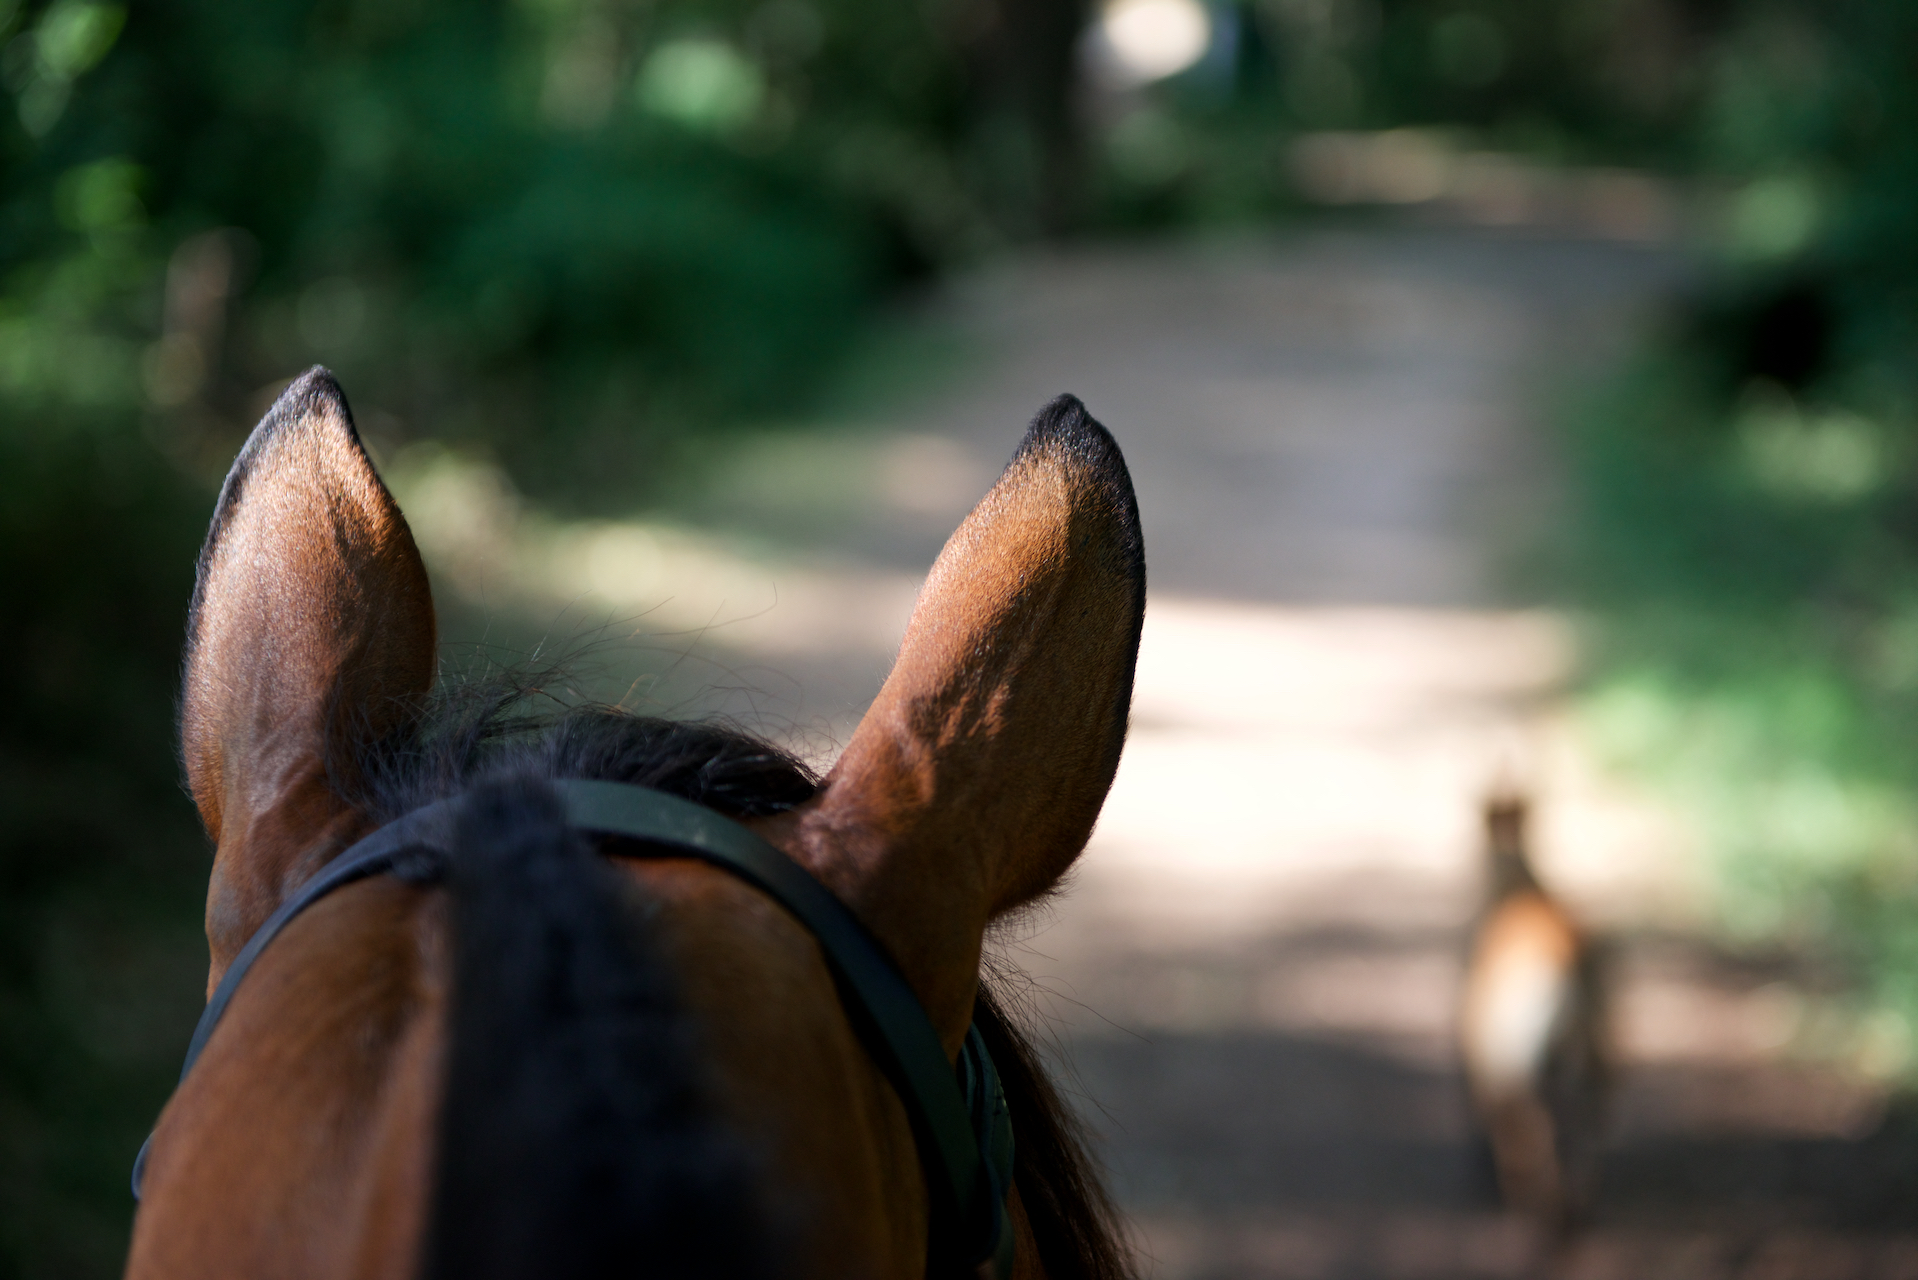 Haras La Colombiere - VDSE - Kissovo des Sables - Equitation Var